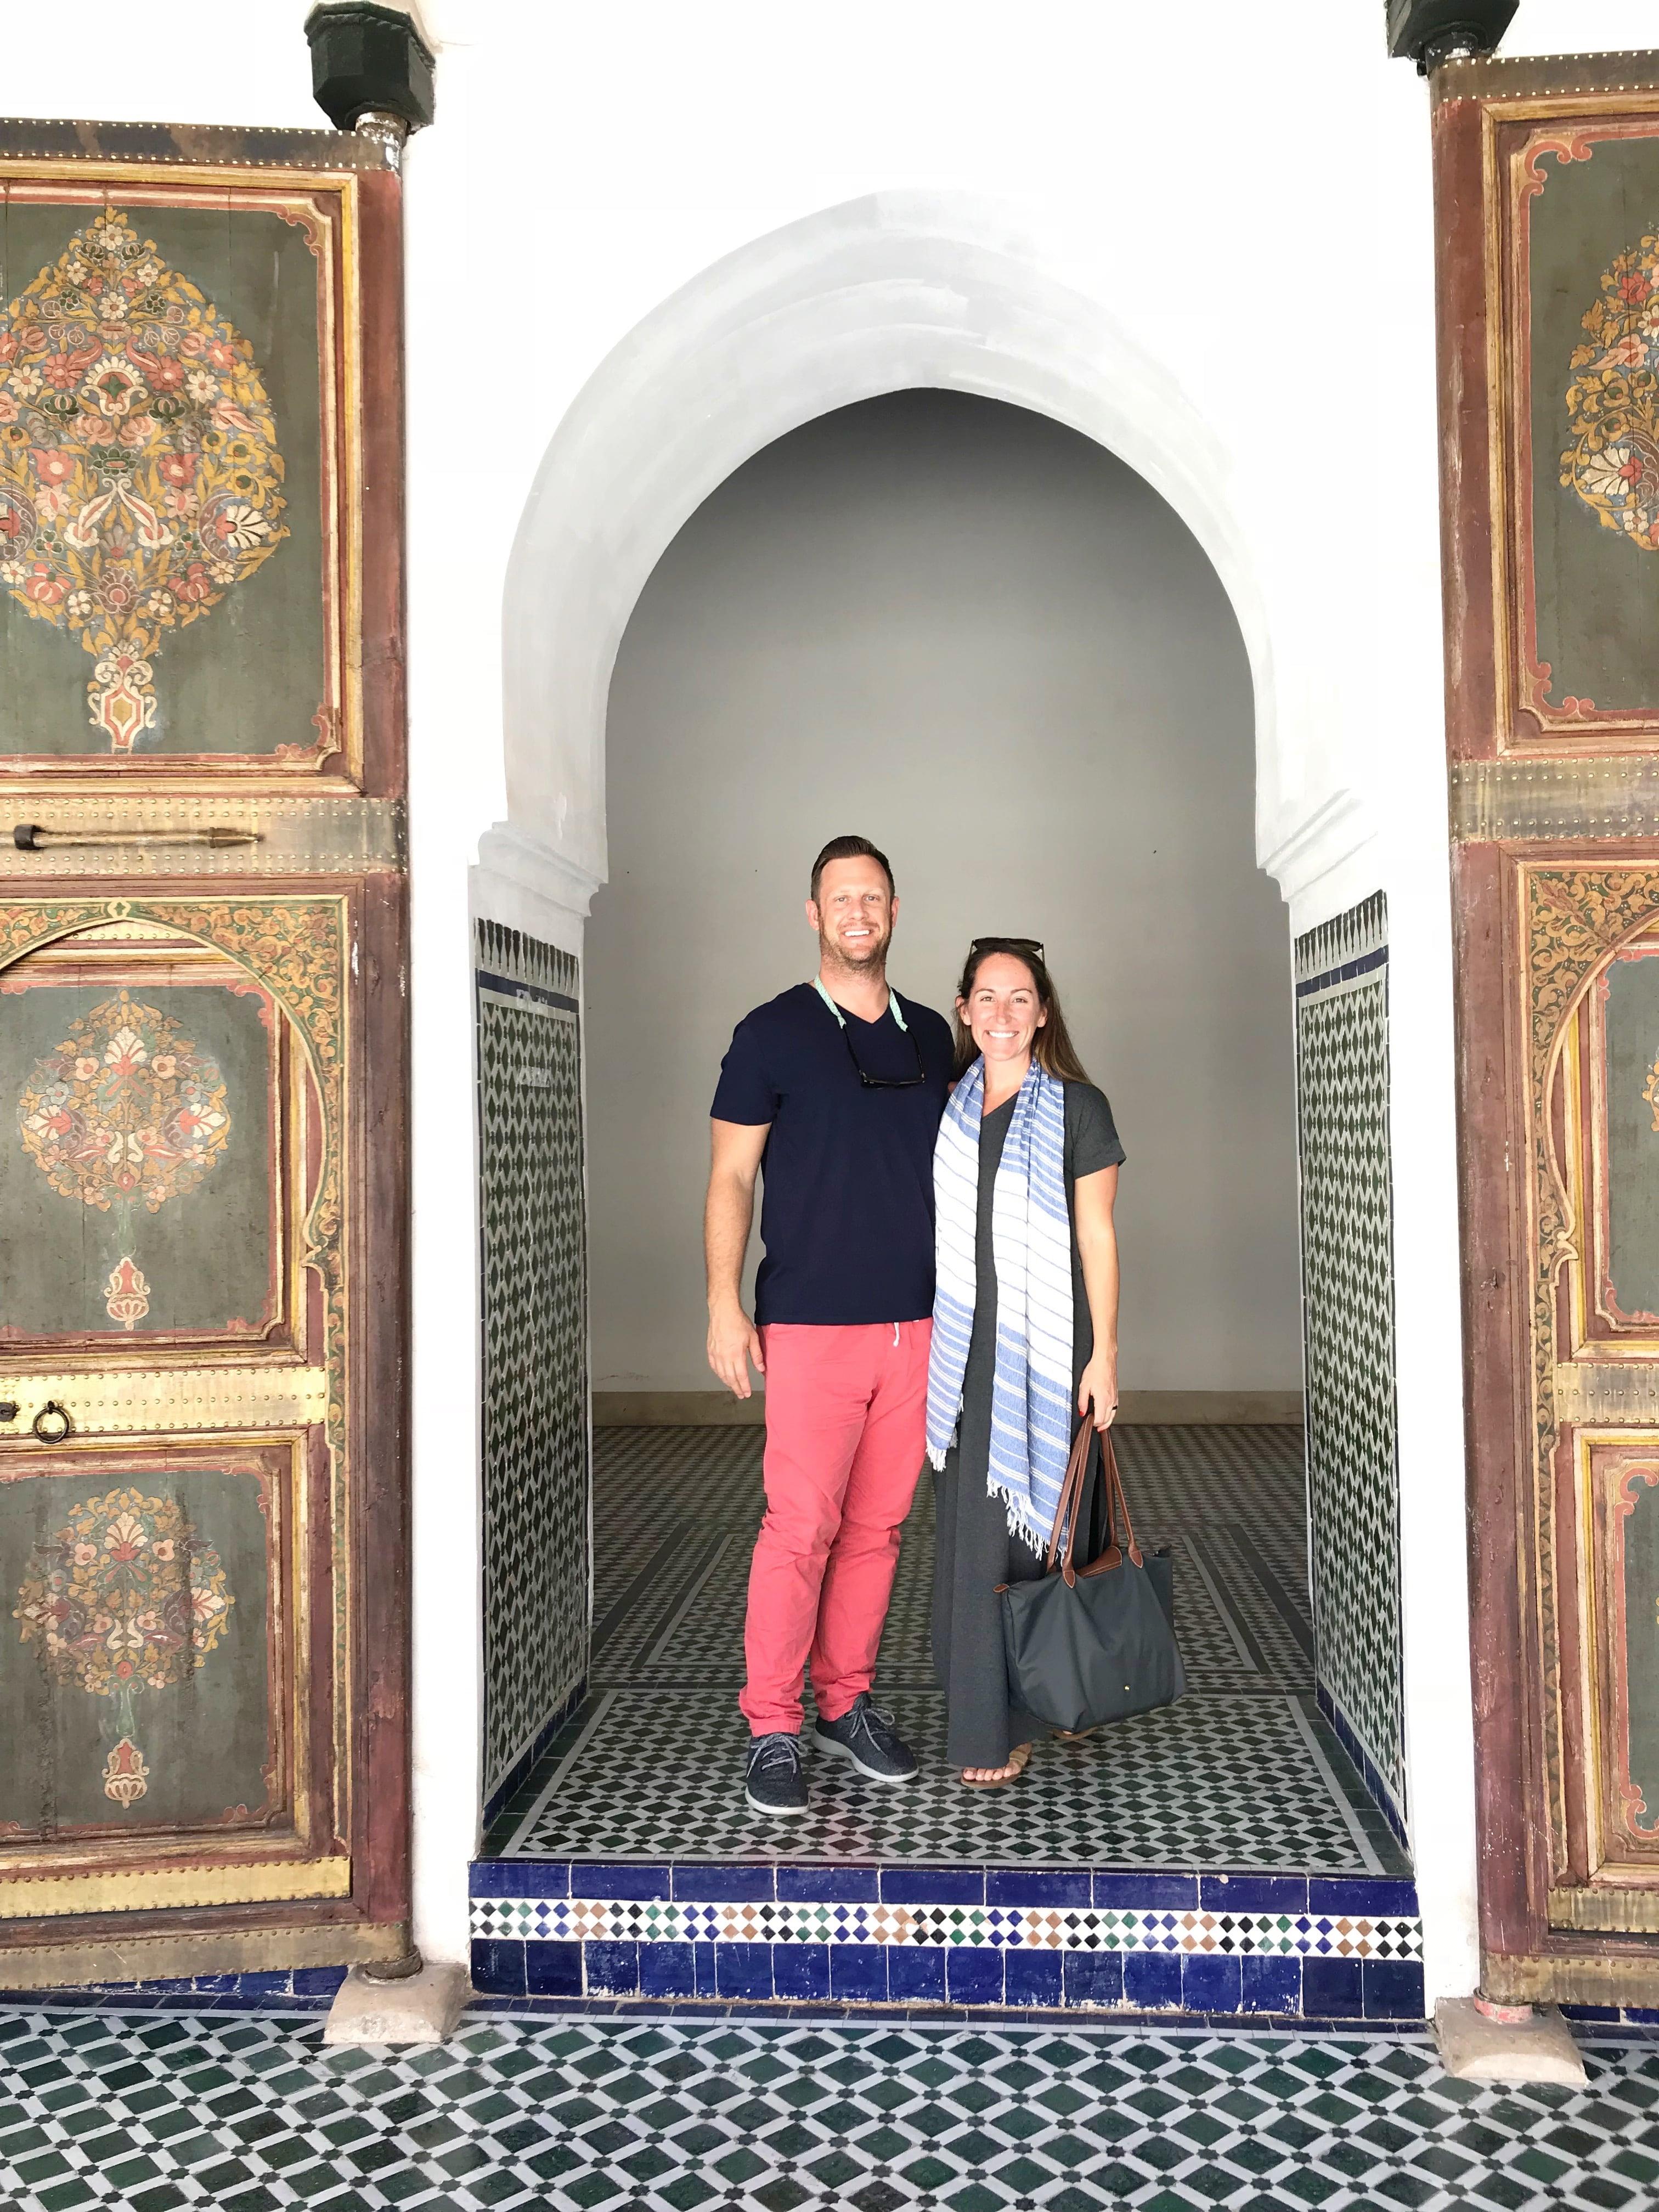 MARRAKECH TRAVEL GUIDE + TIPS | Majorelle Gardens - Marrakech Travel Guide - Marrakech Travel - Marrakech Morocco - Shopping In Marrakech - What To See In Marrakech - What To Do In Marrakech - Marrakech Travel Blog - Marrakech Hotels - Marrakech Weather - Marrakesh - Morocco Travel Blog - Bahia Palace - #morocco #travel #marrakech